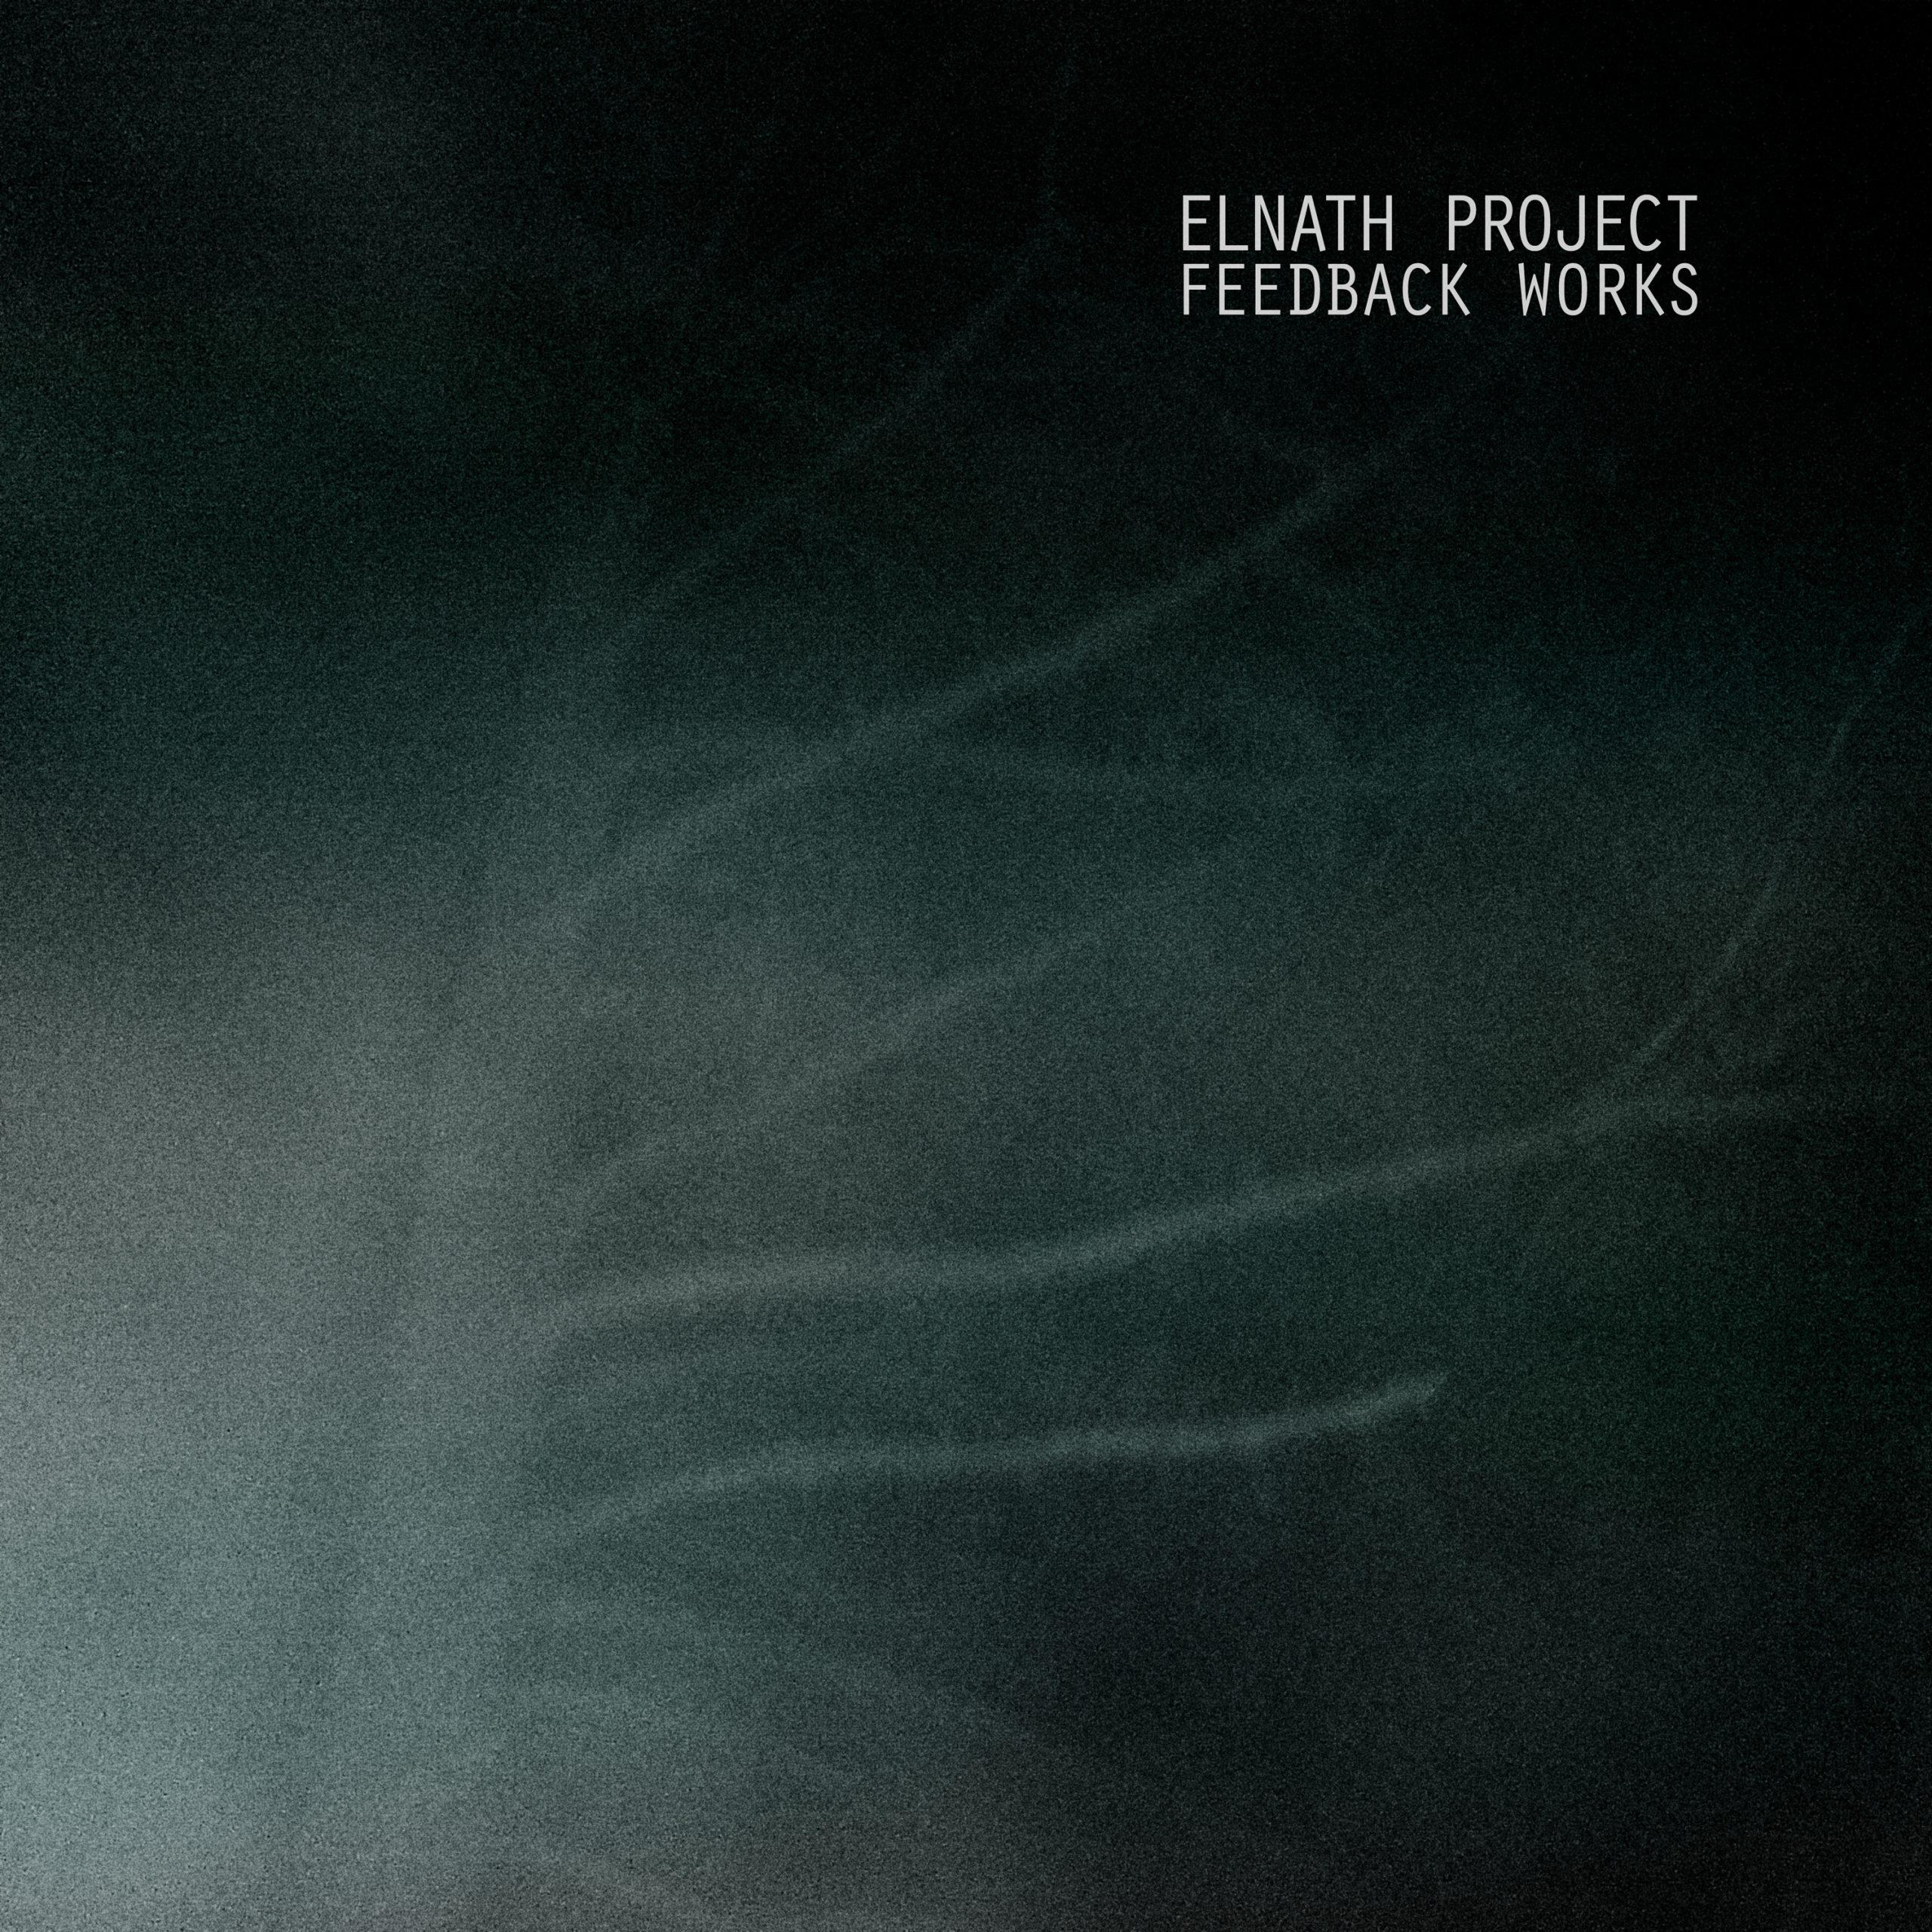 elnath project